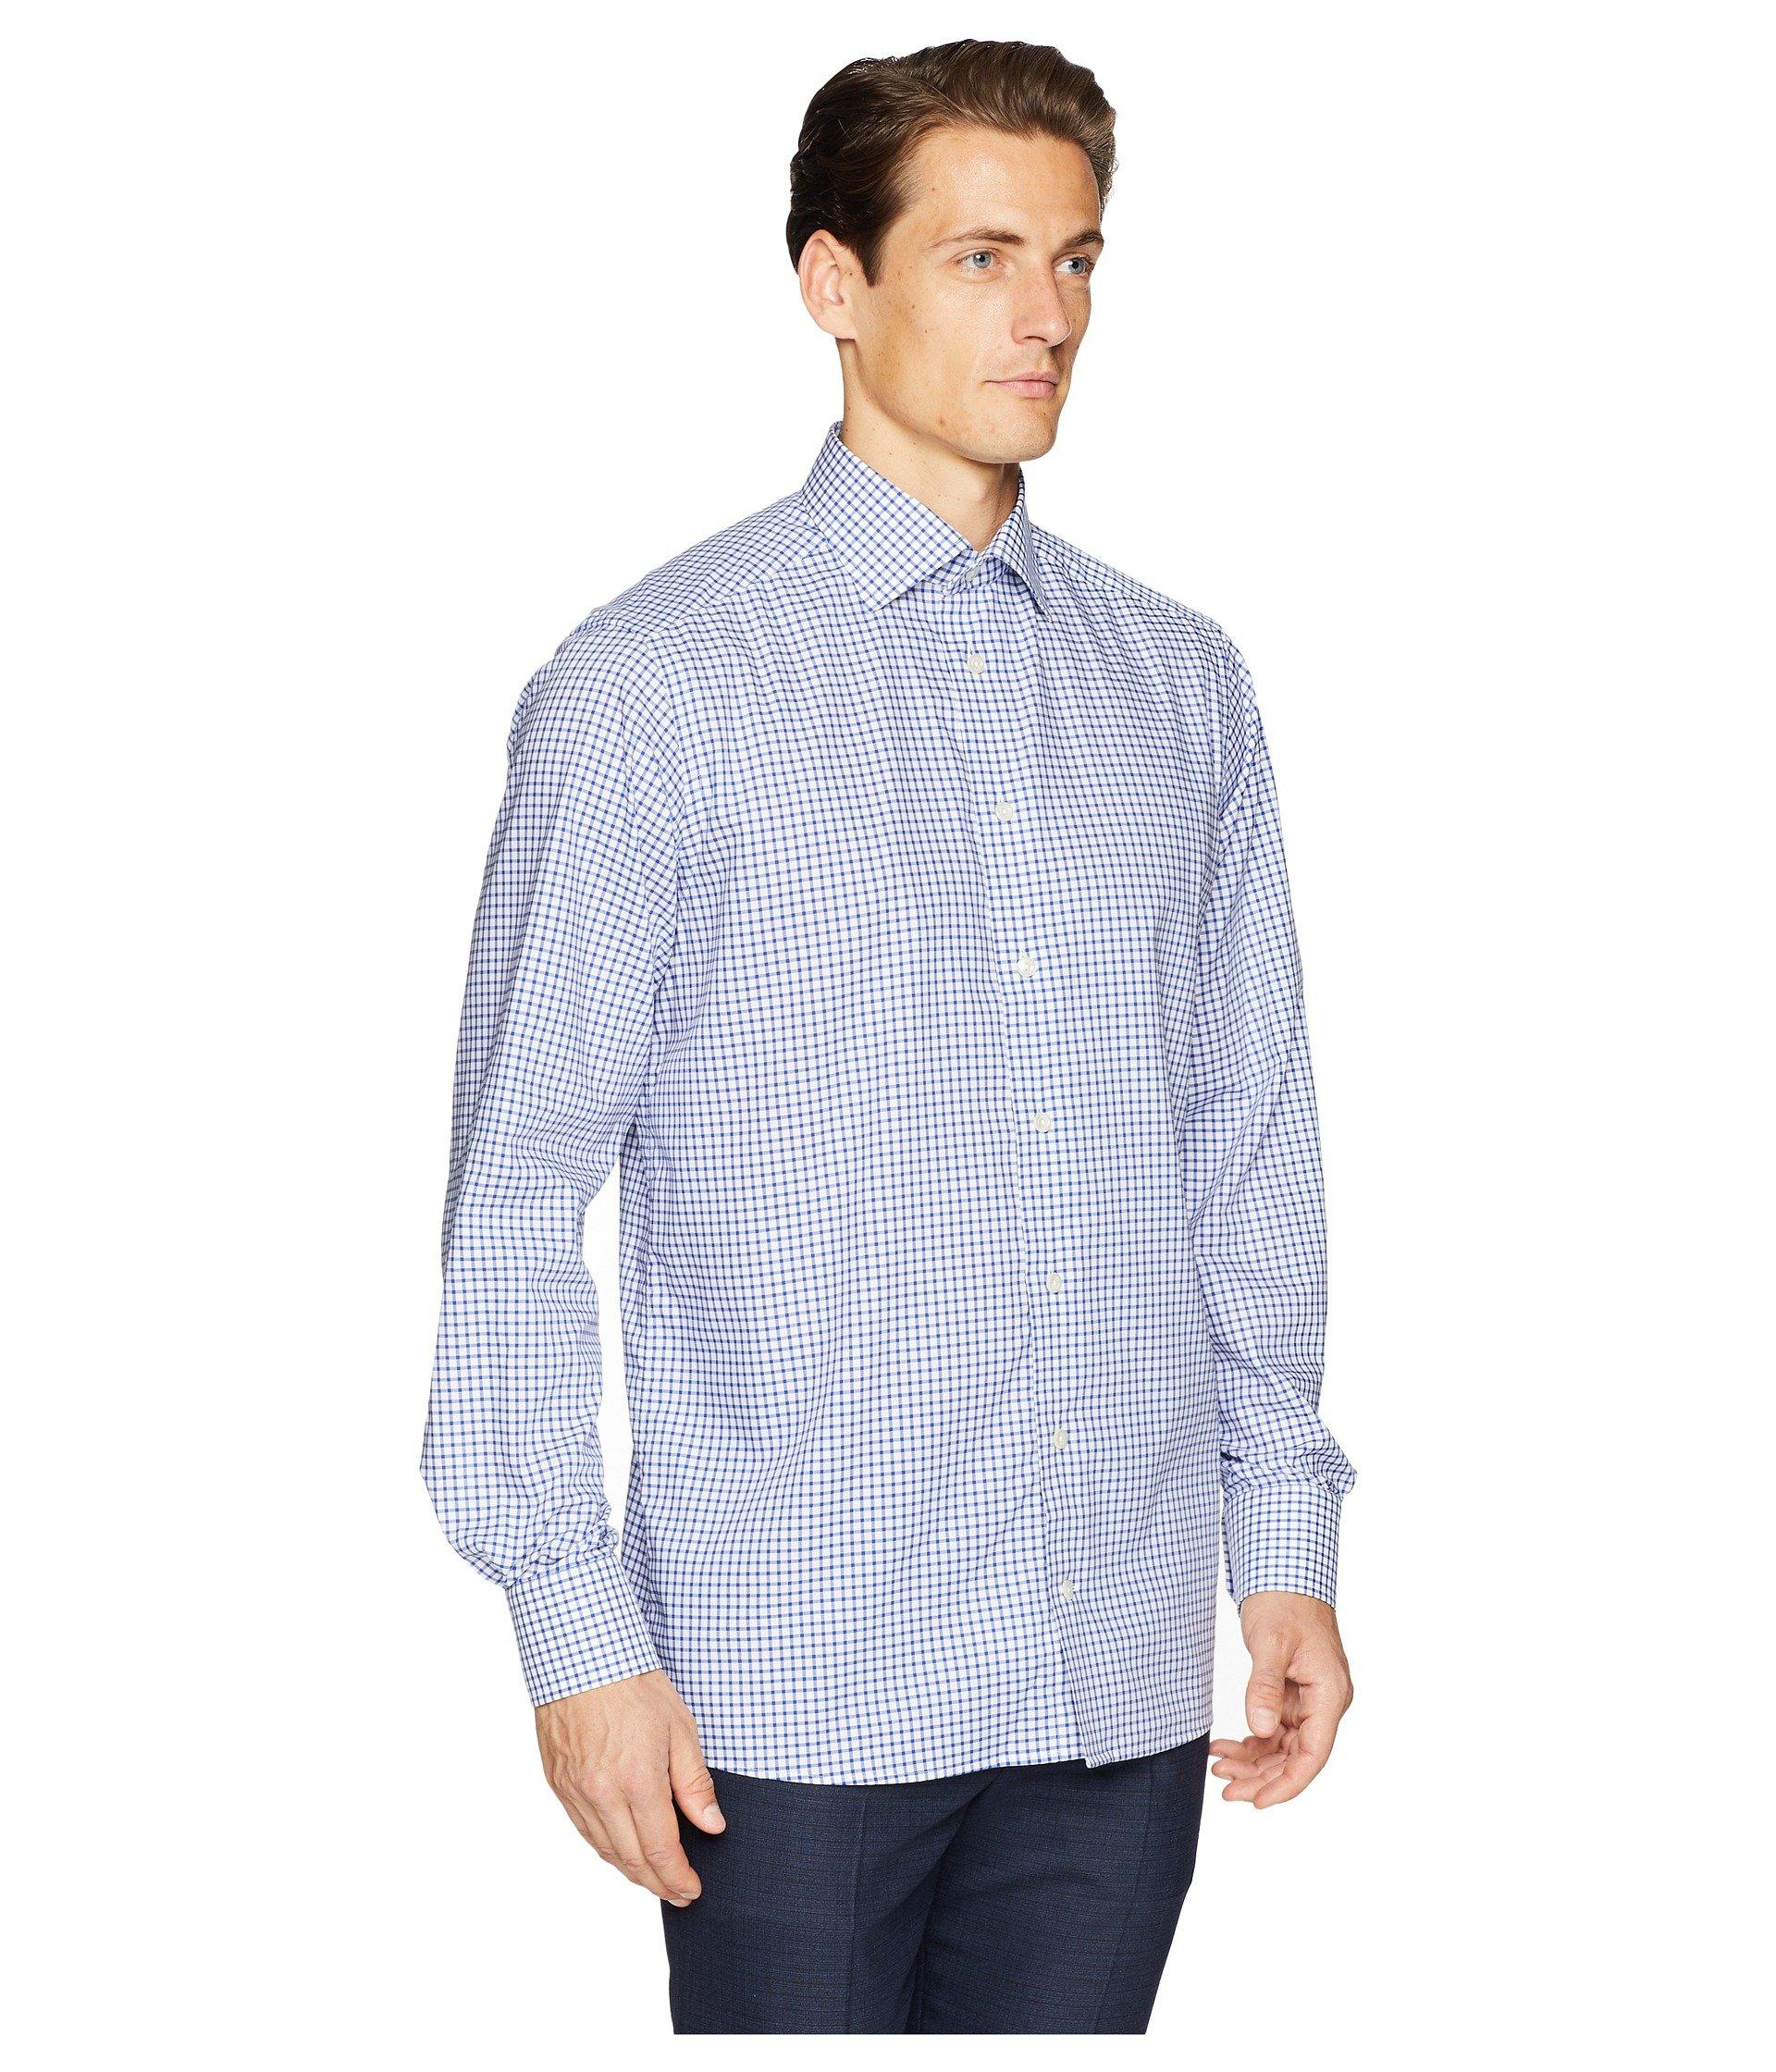 Contemporary Fit Shirt Blue Grid Check Stretch Eton fd5ARqwf